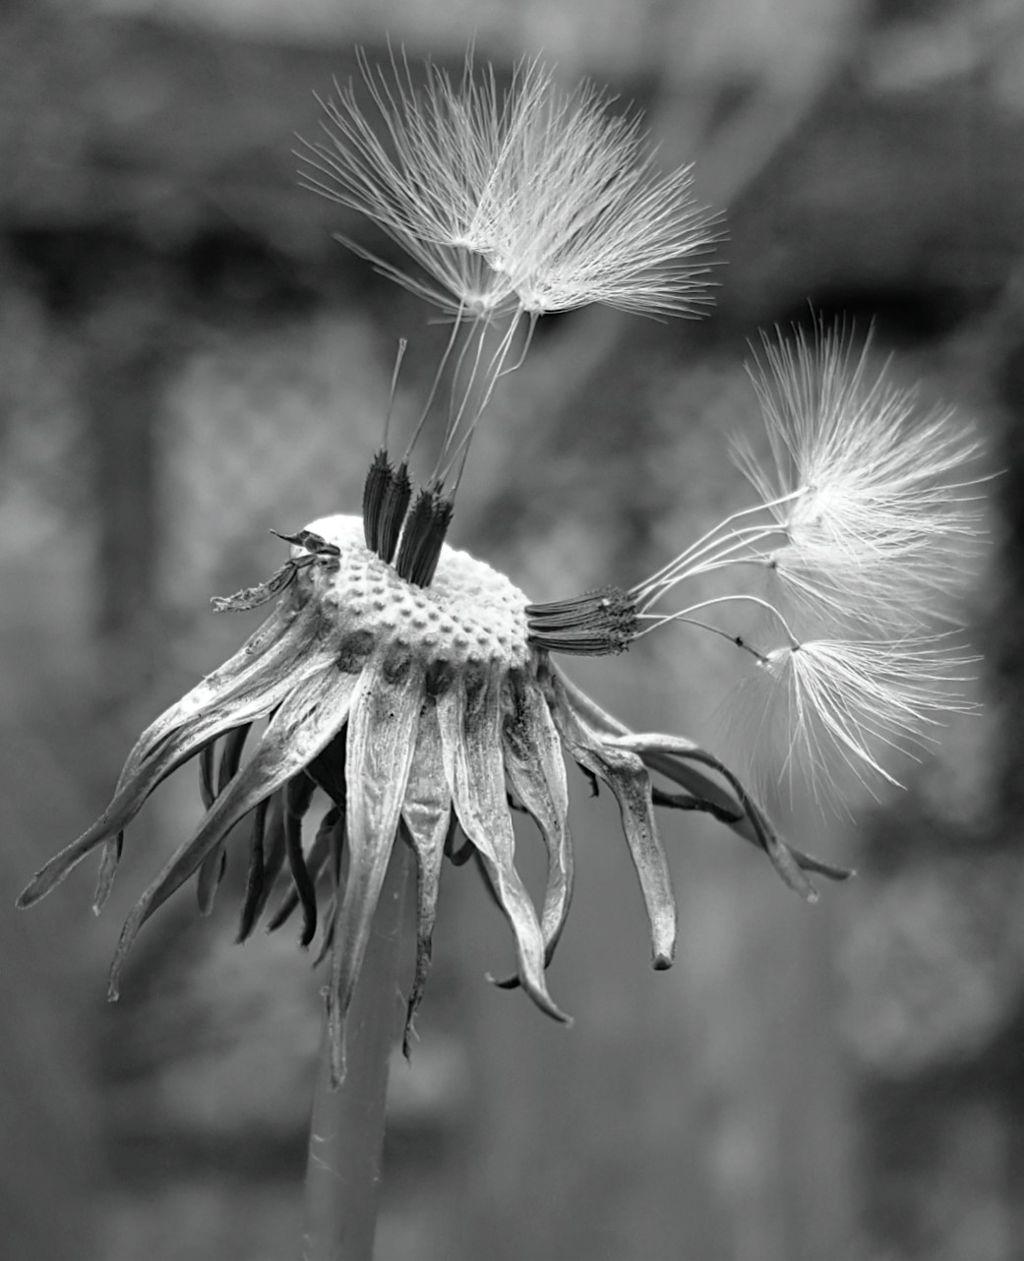 #freetoedit #mypic #today #dandelion #blackandwhite